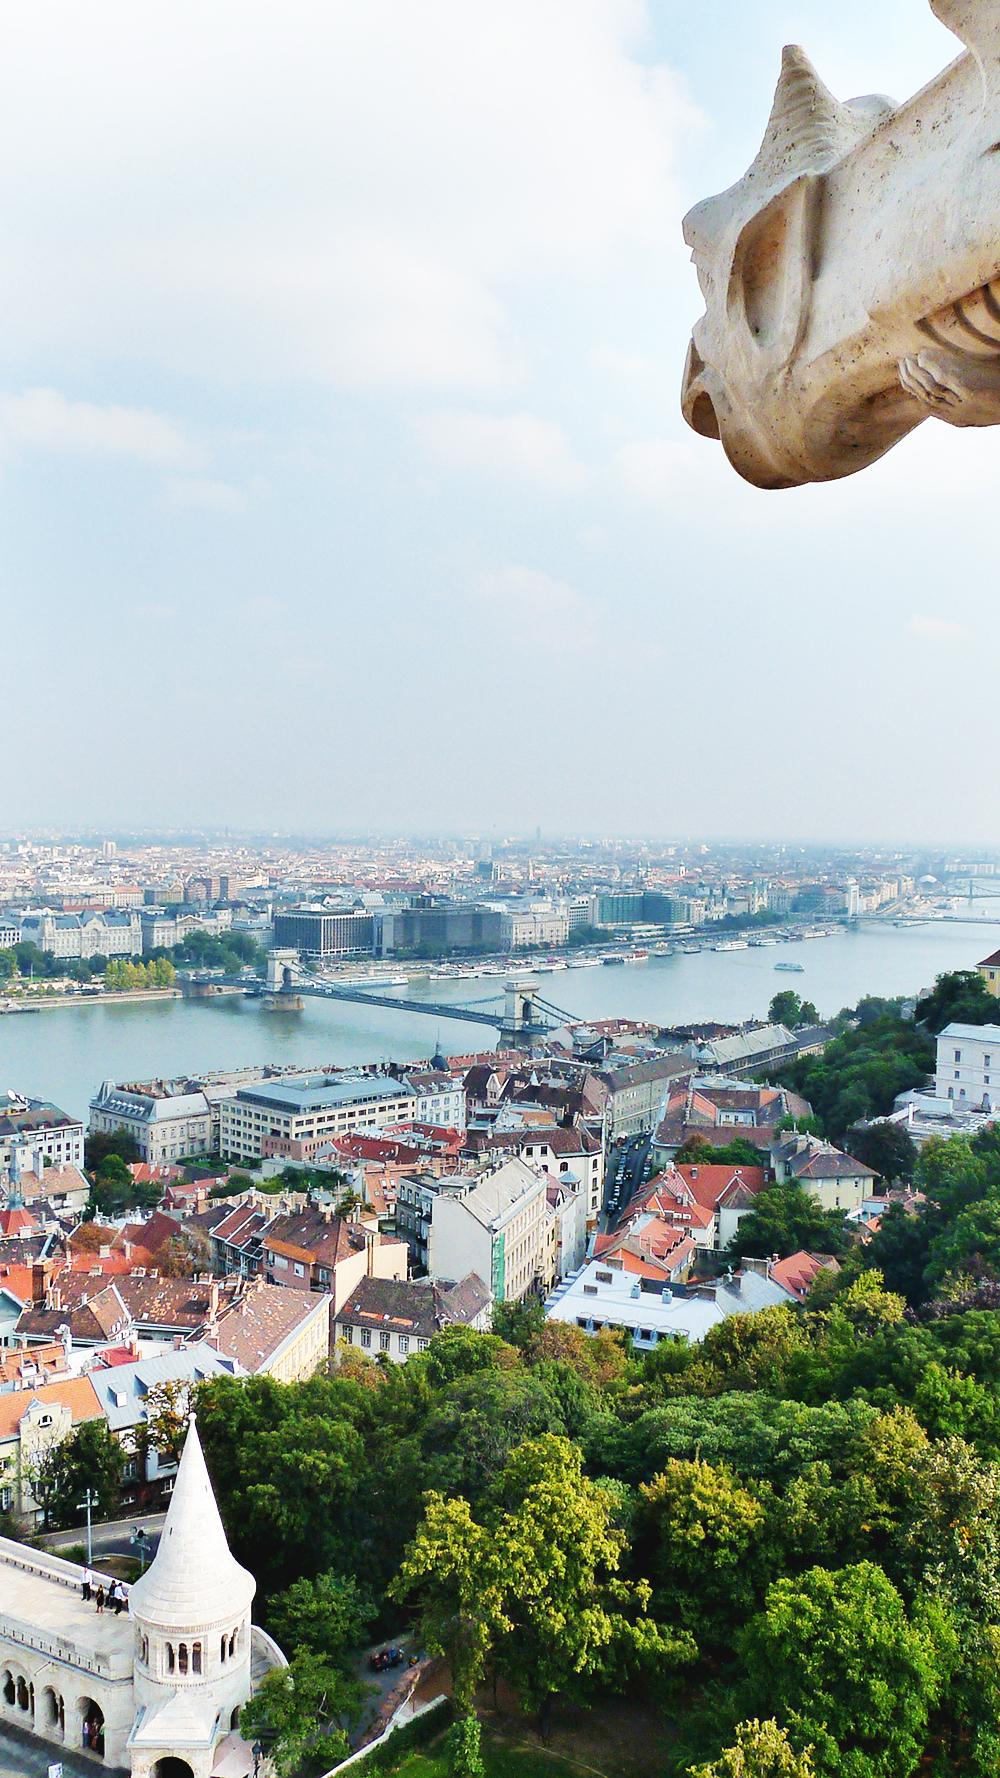 Wander around Castle District, Matthias Church - Budapest bucket list - Top things to do in Budapest | Aliz's Wonderland #travel #Budapest #bucketlist #Budapestbucketlist #printable